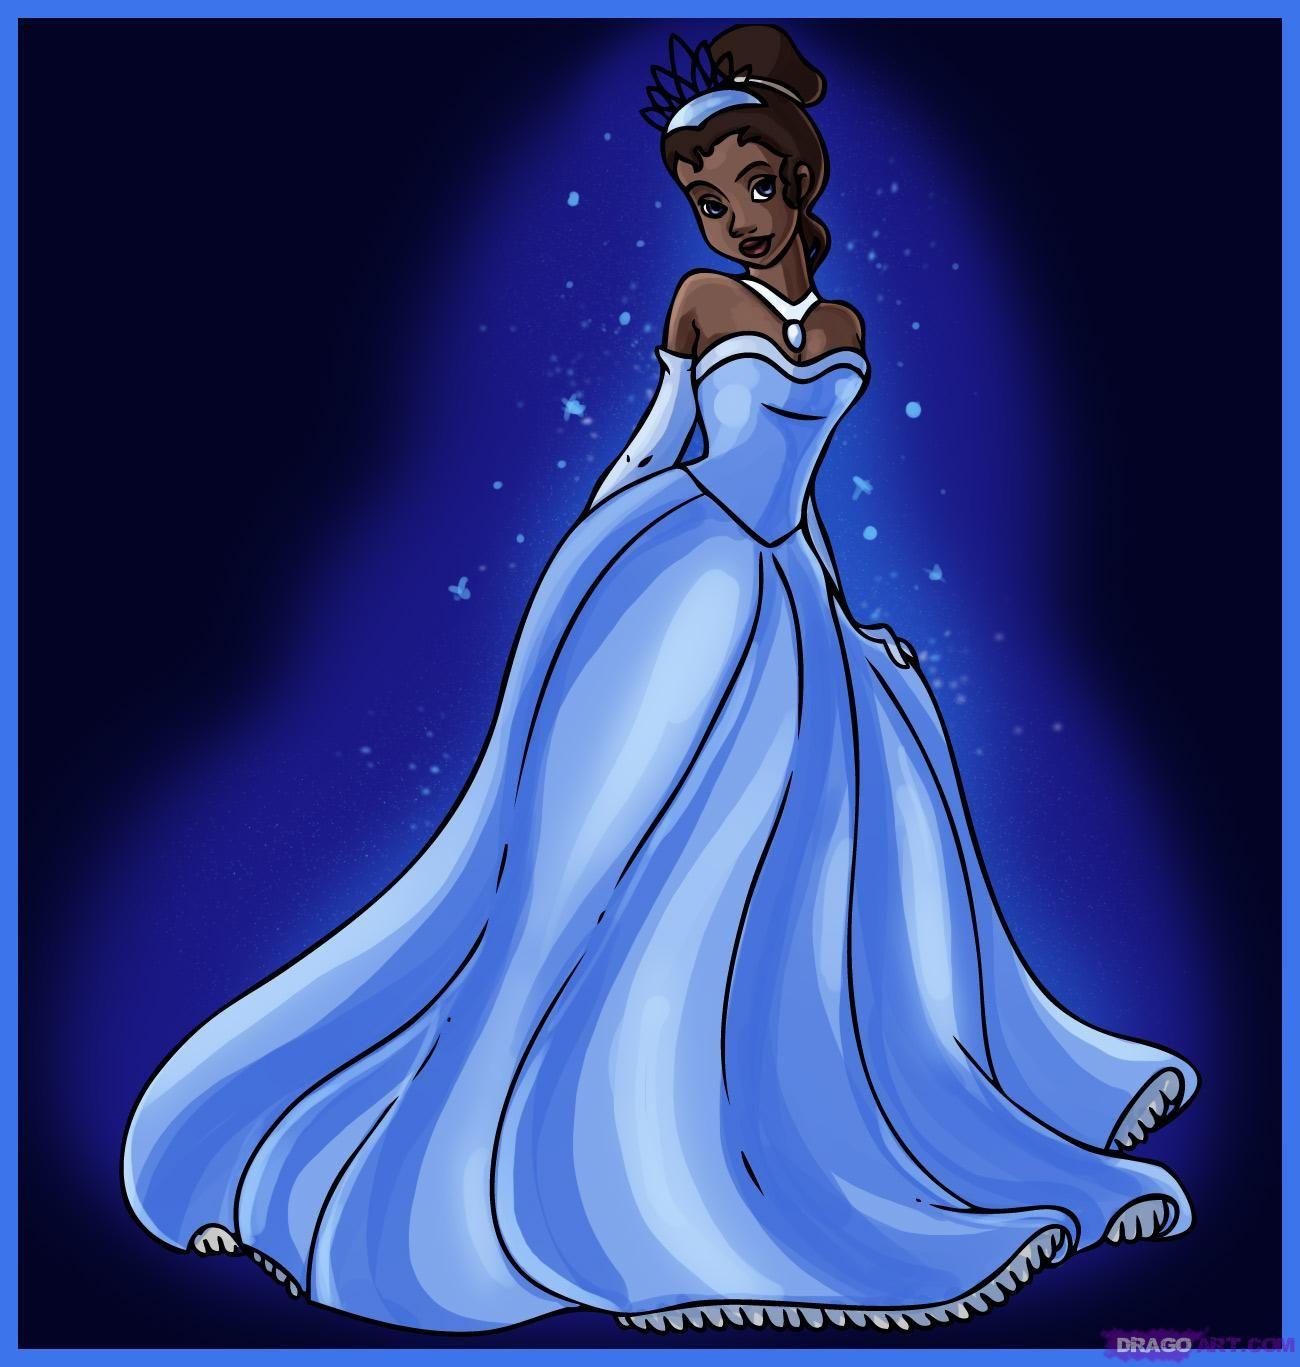 Princess Tiana Face: How To Draw Princess Tiana From The Princess And The Frog